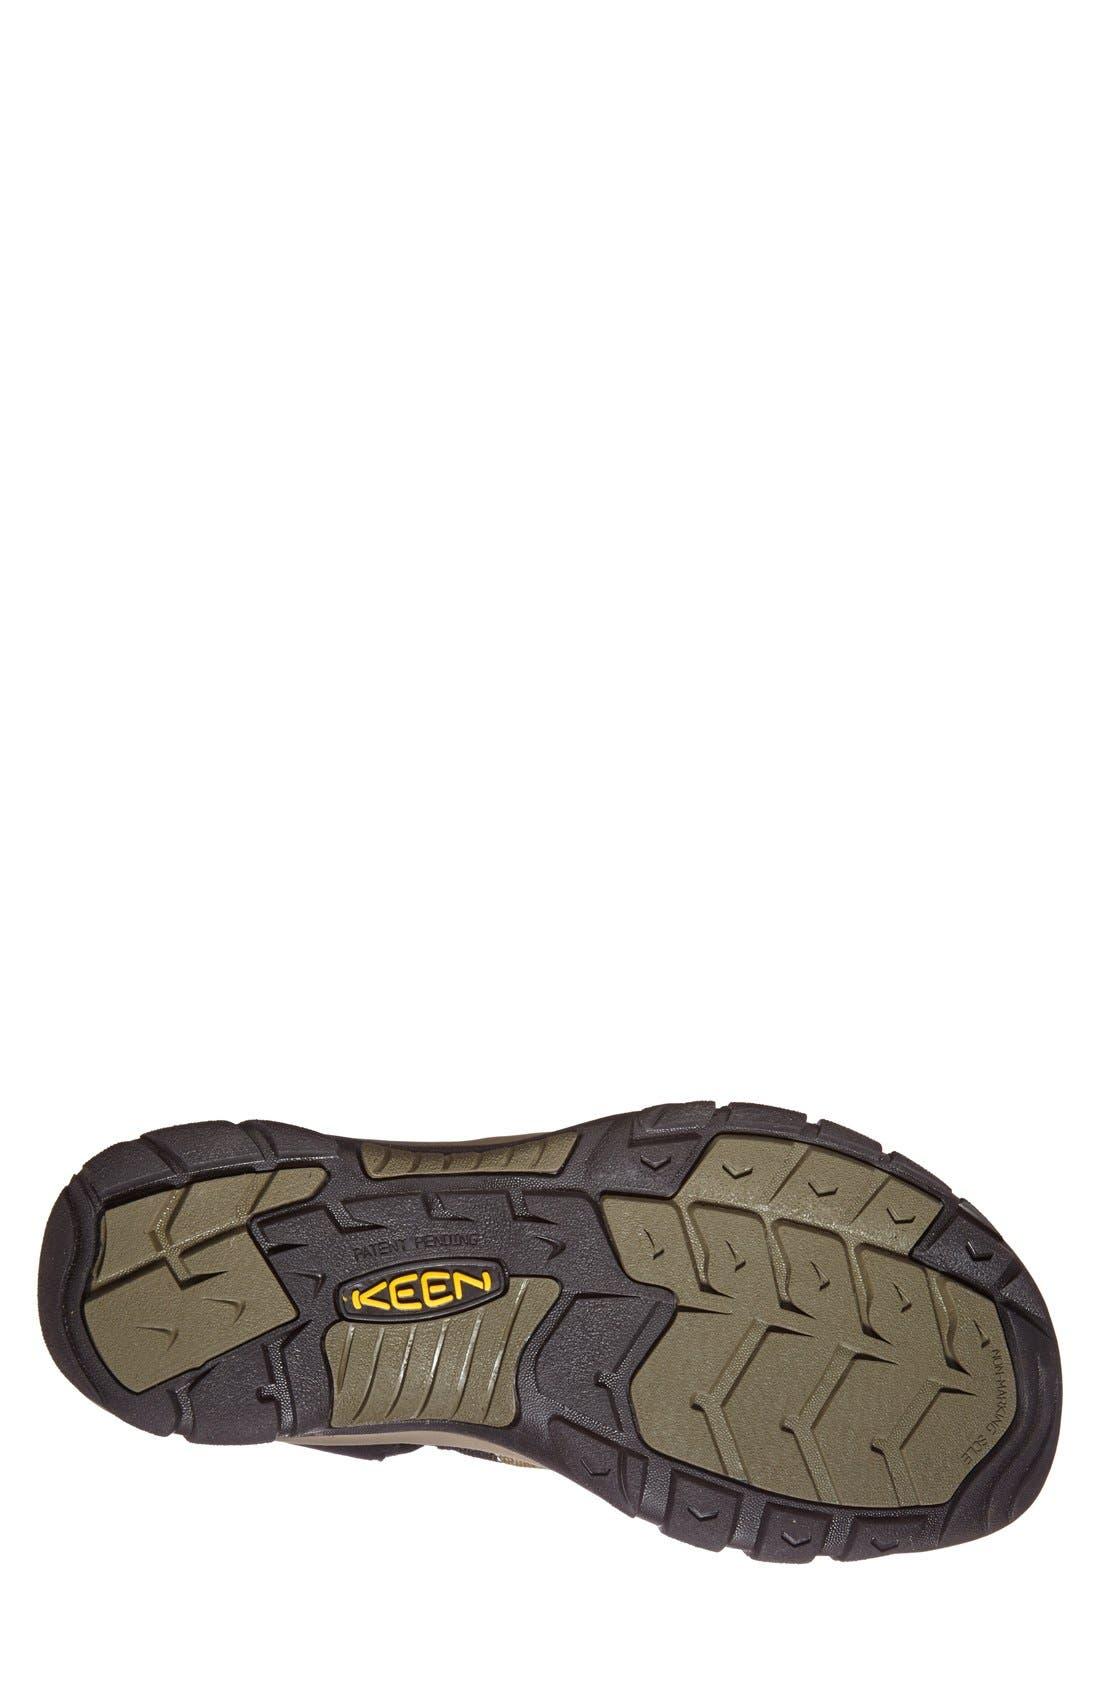 'Newport H2' Sandal,                             Alternate thumbnail 3, color,                             BLACK/ STONE GREY